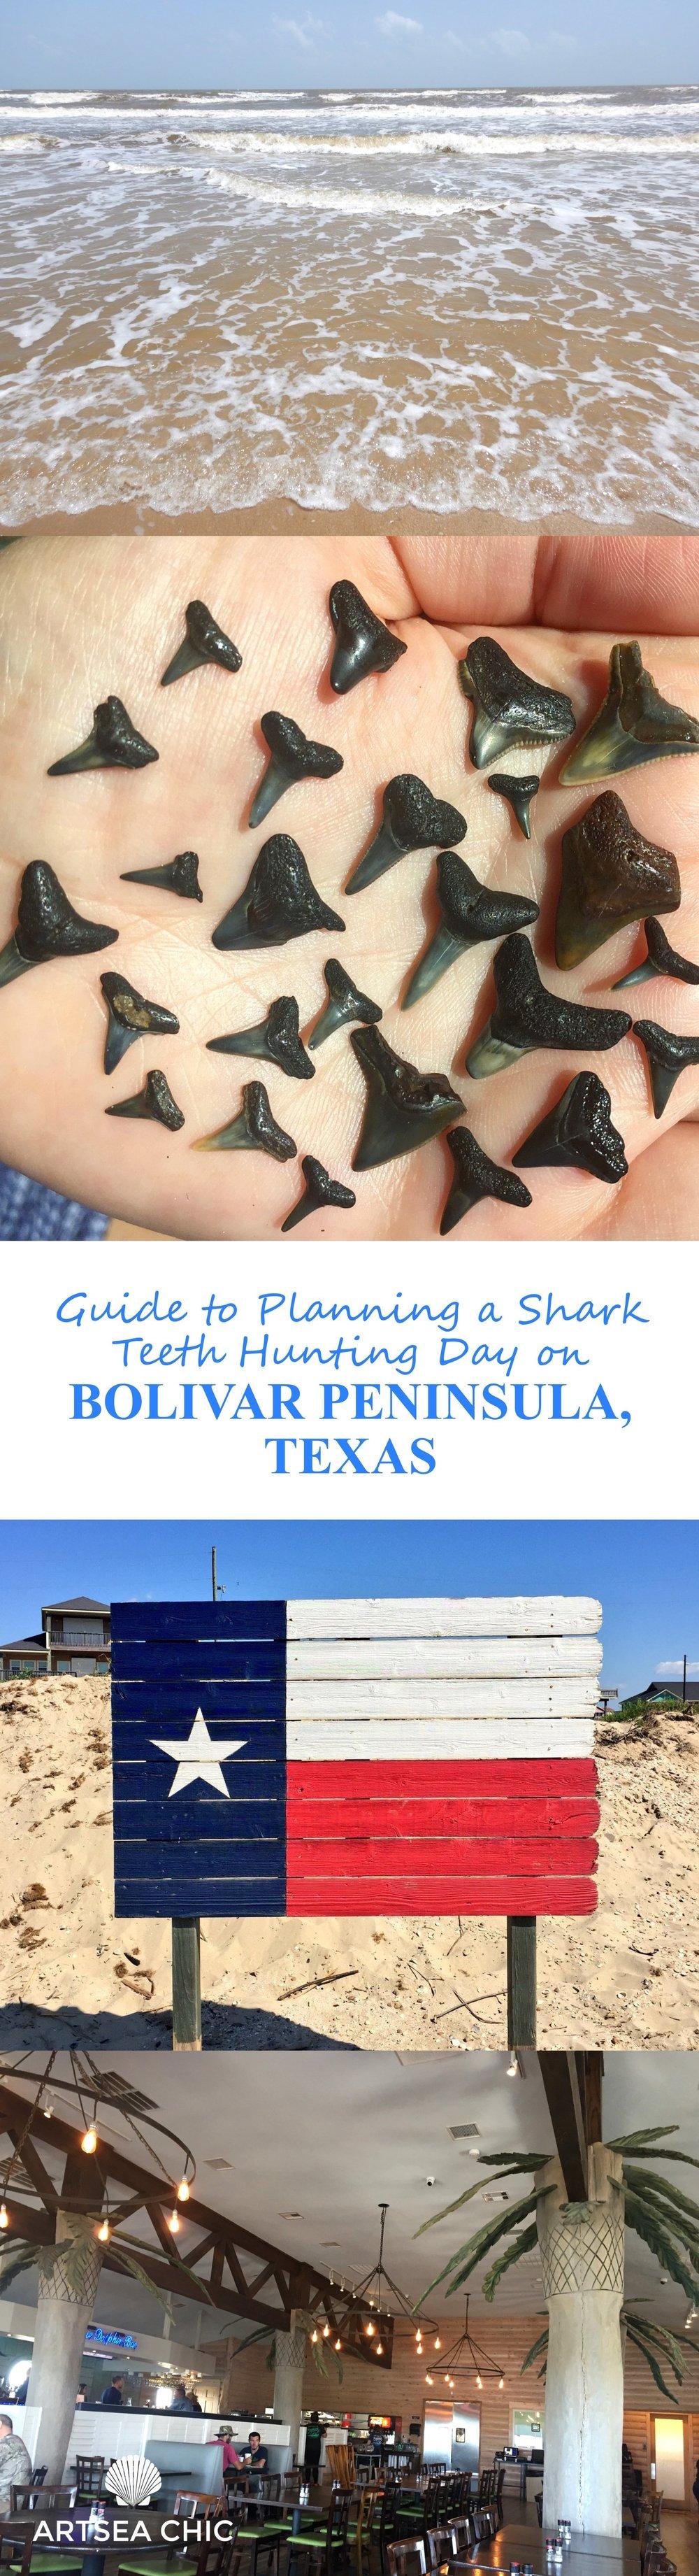 Guide to Planning a Shark Teeth Hunting Trip on Bolivar Peninsula.jpg